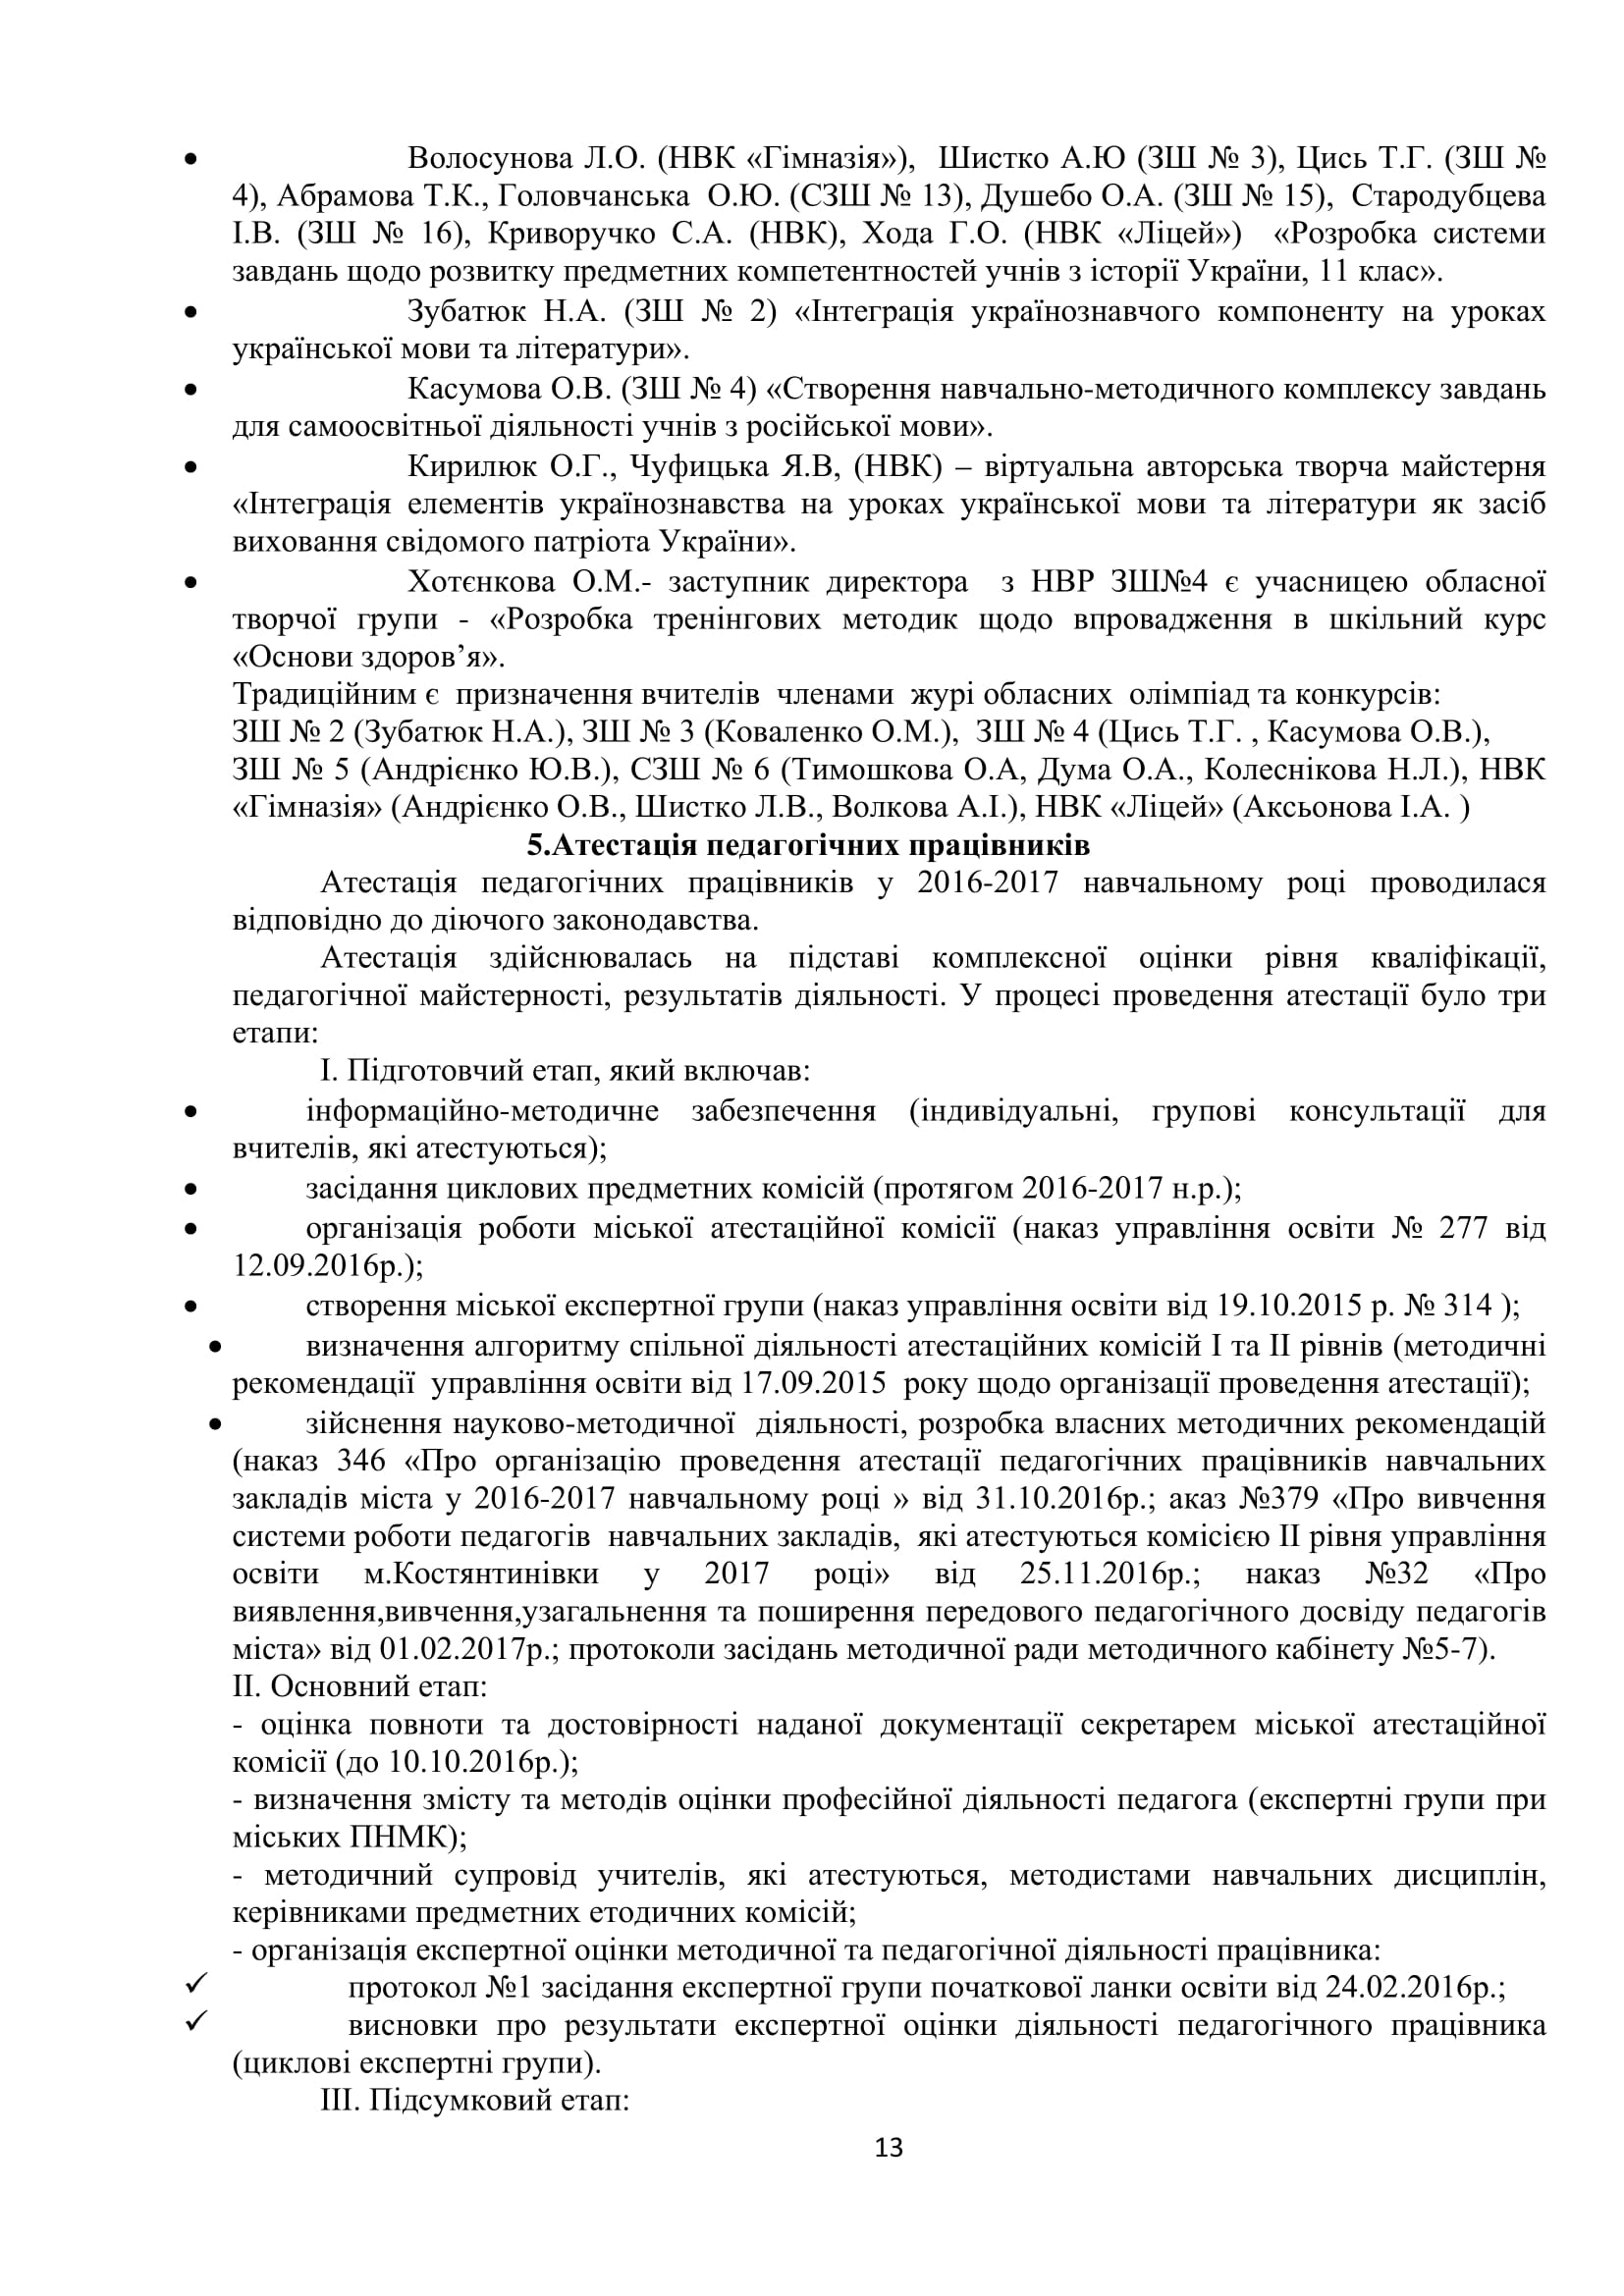 2017-2018 - ММК план роботи-14